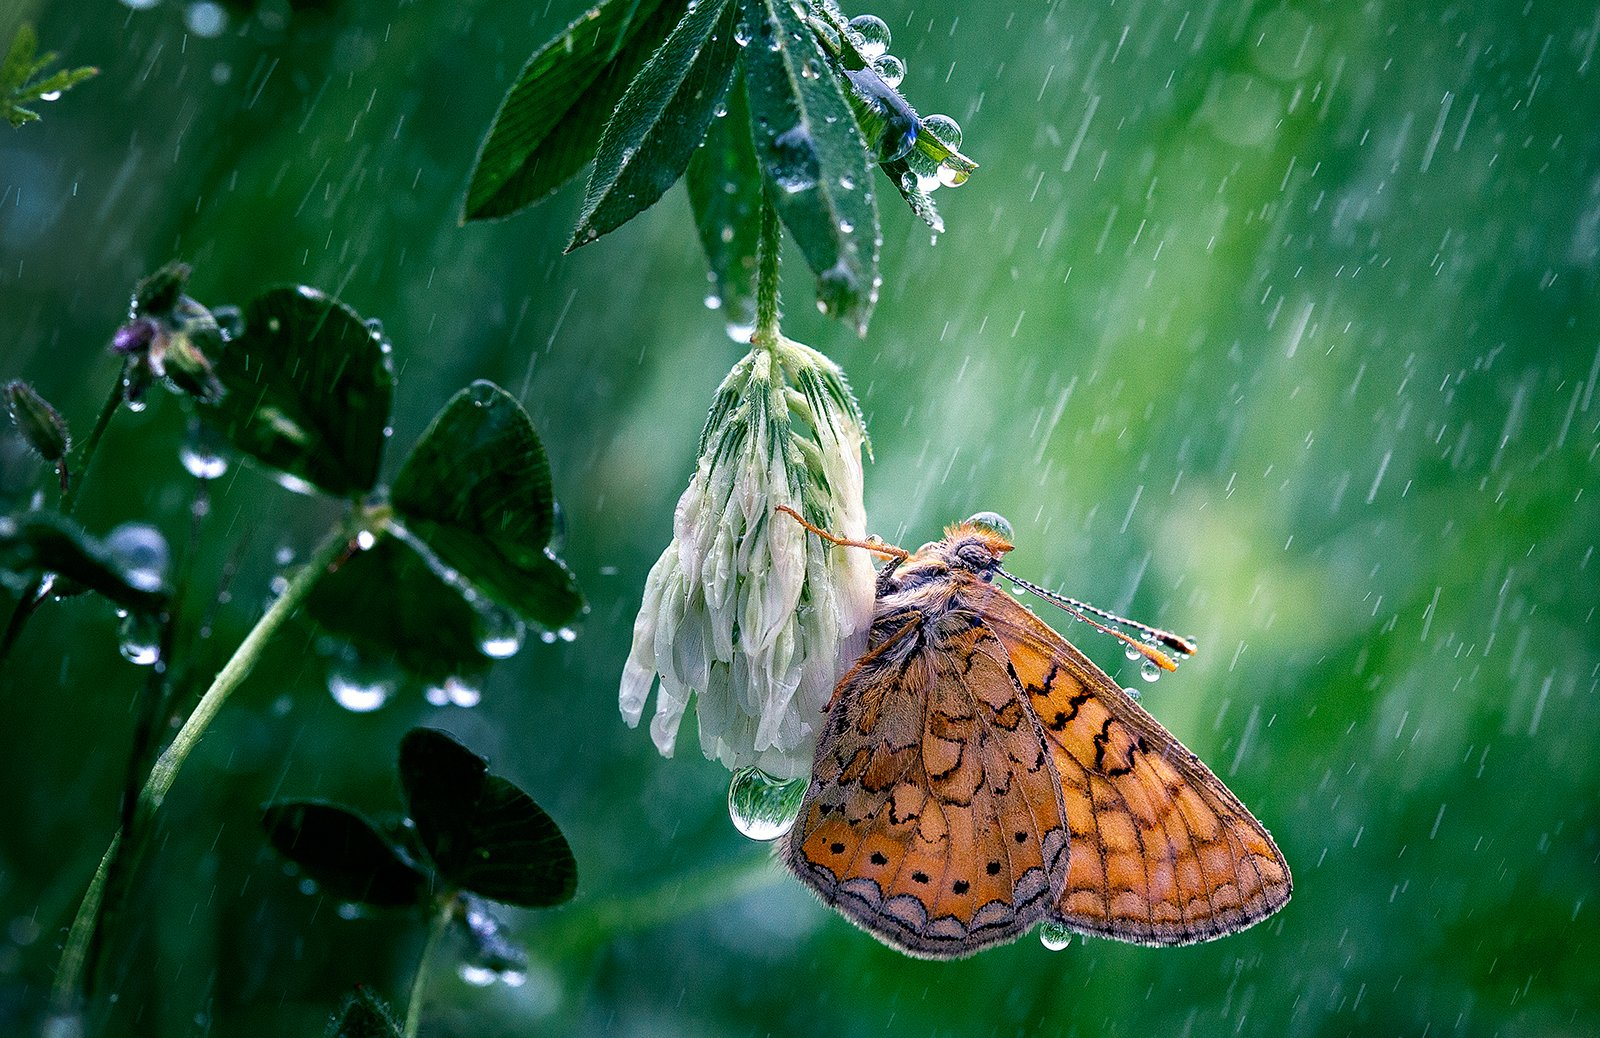 insects,butterfly,macro,beautiful,insect,wild,wildlife,nature,faerie,close up,rainy,rain,drops,fairy,, Georgi Georgiev